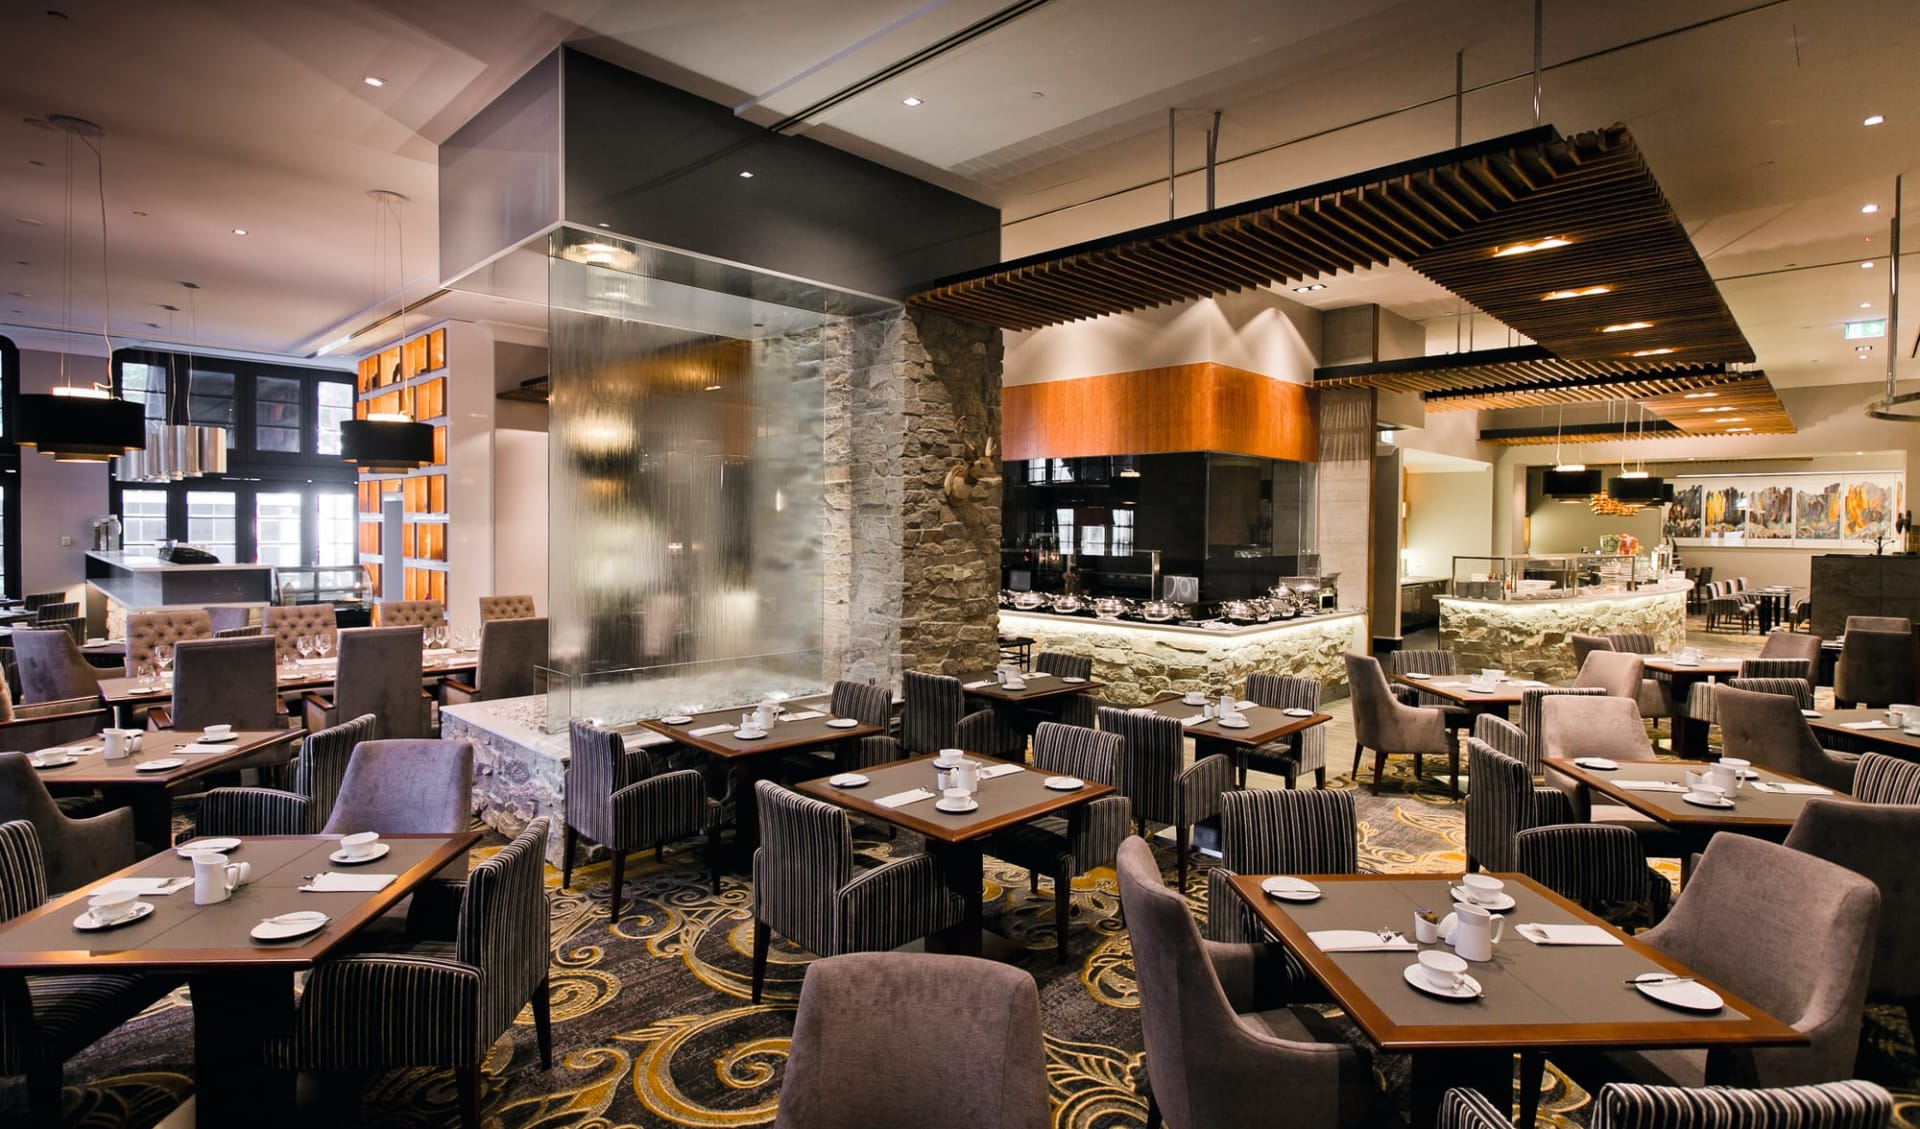 Duxton Hotel Perth:  Duxton Hotel Perth - Restaurant Firewater Grille 2017